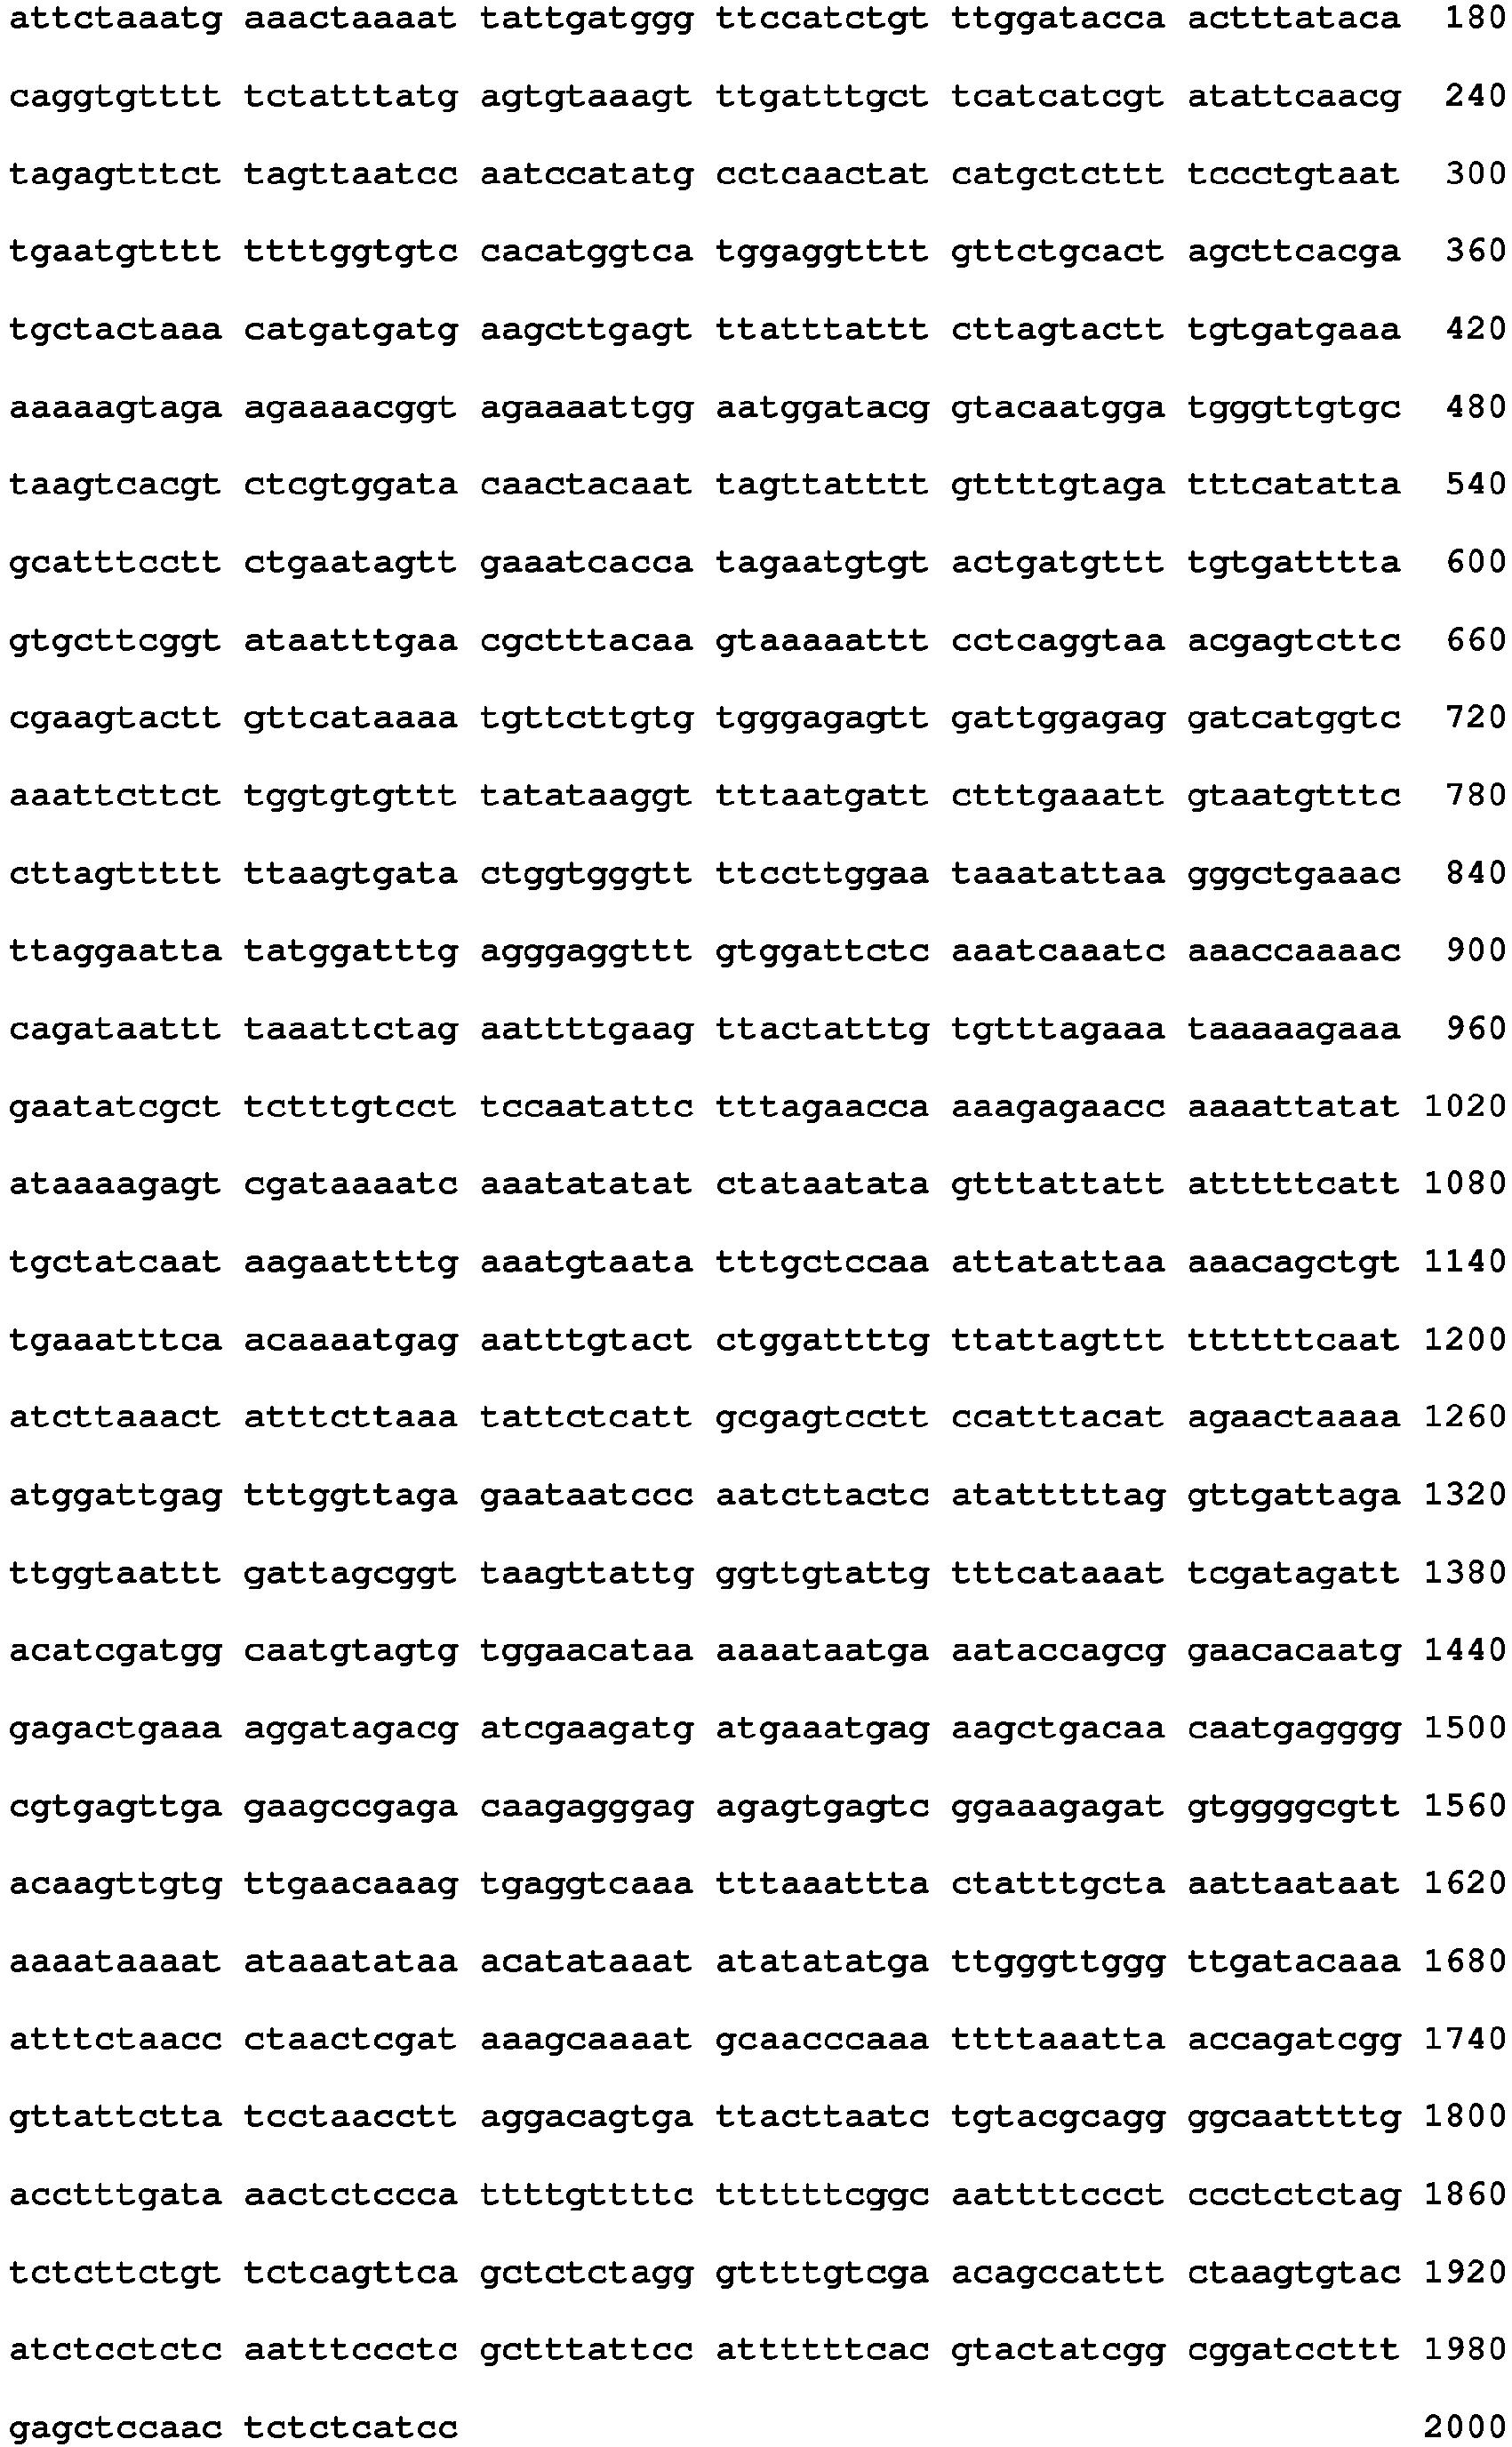 Figure imgb0146